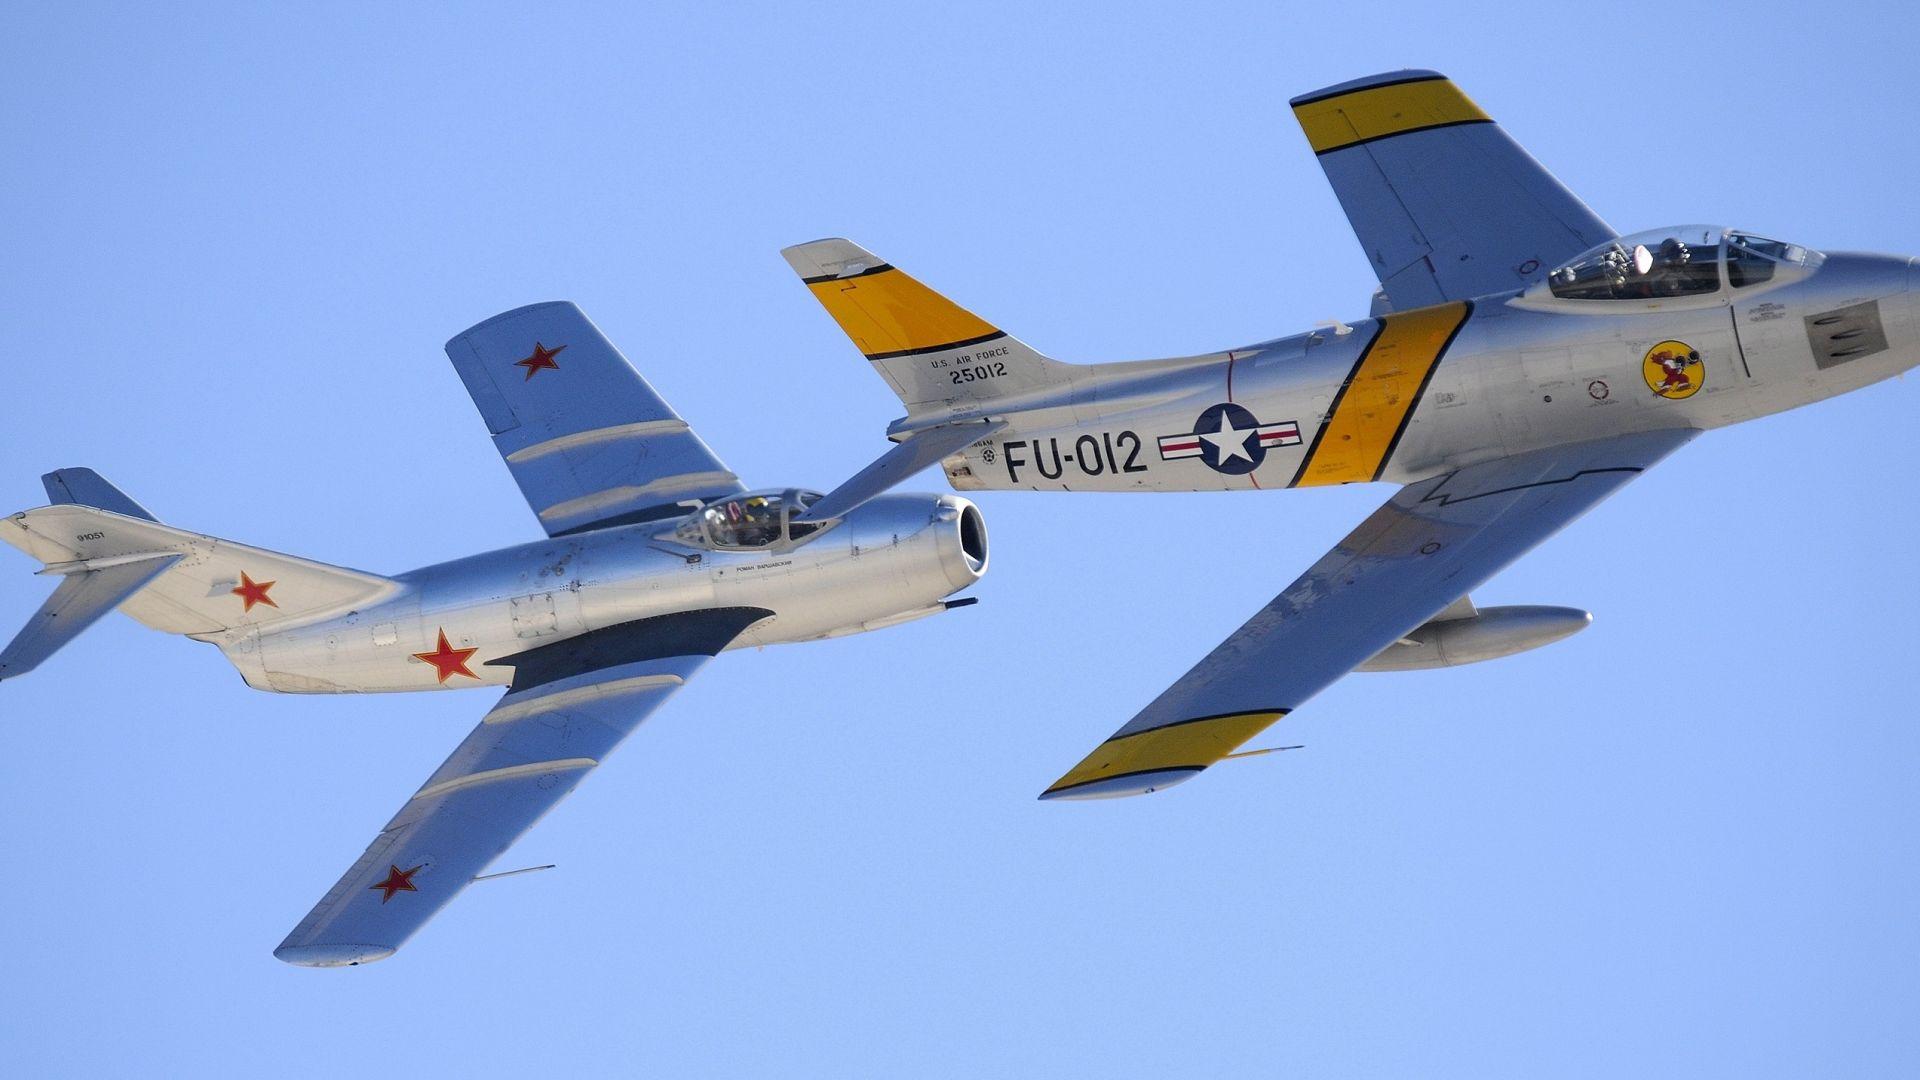 МиГ-15 срещу F-86 Sabre (снимки)